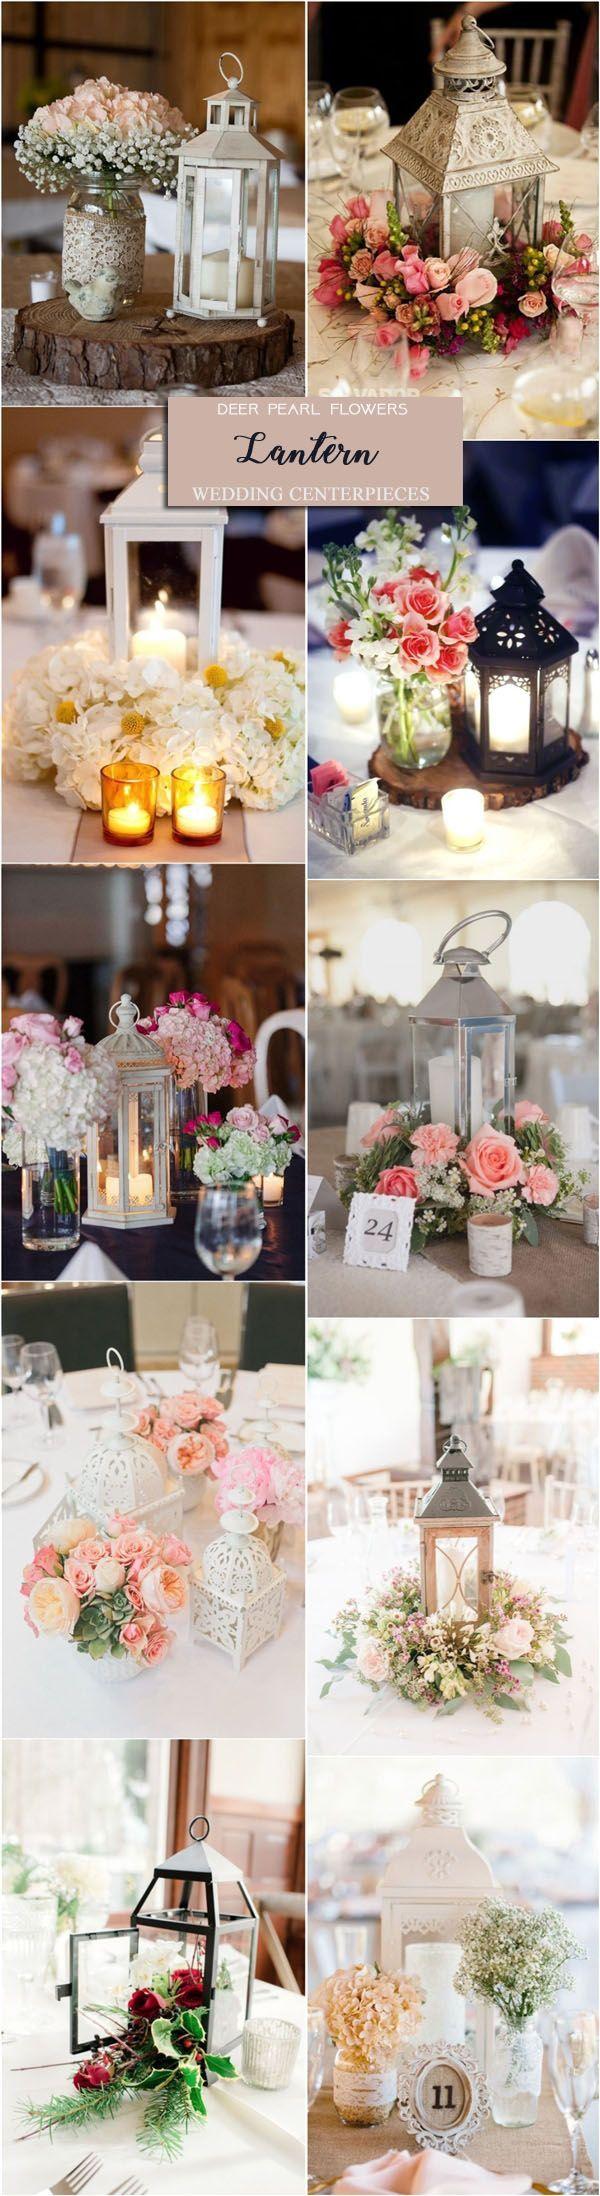 Traditional wedding decor ideas 2018   Insanely Wedding Centerpiece Ideas Youull Love  Wedding